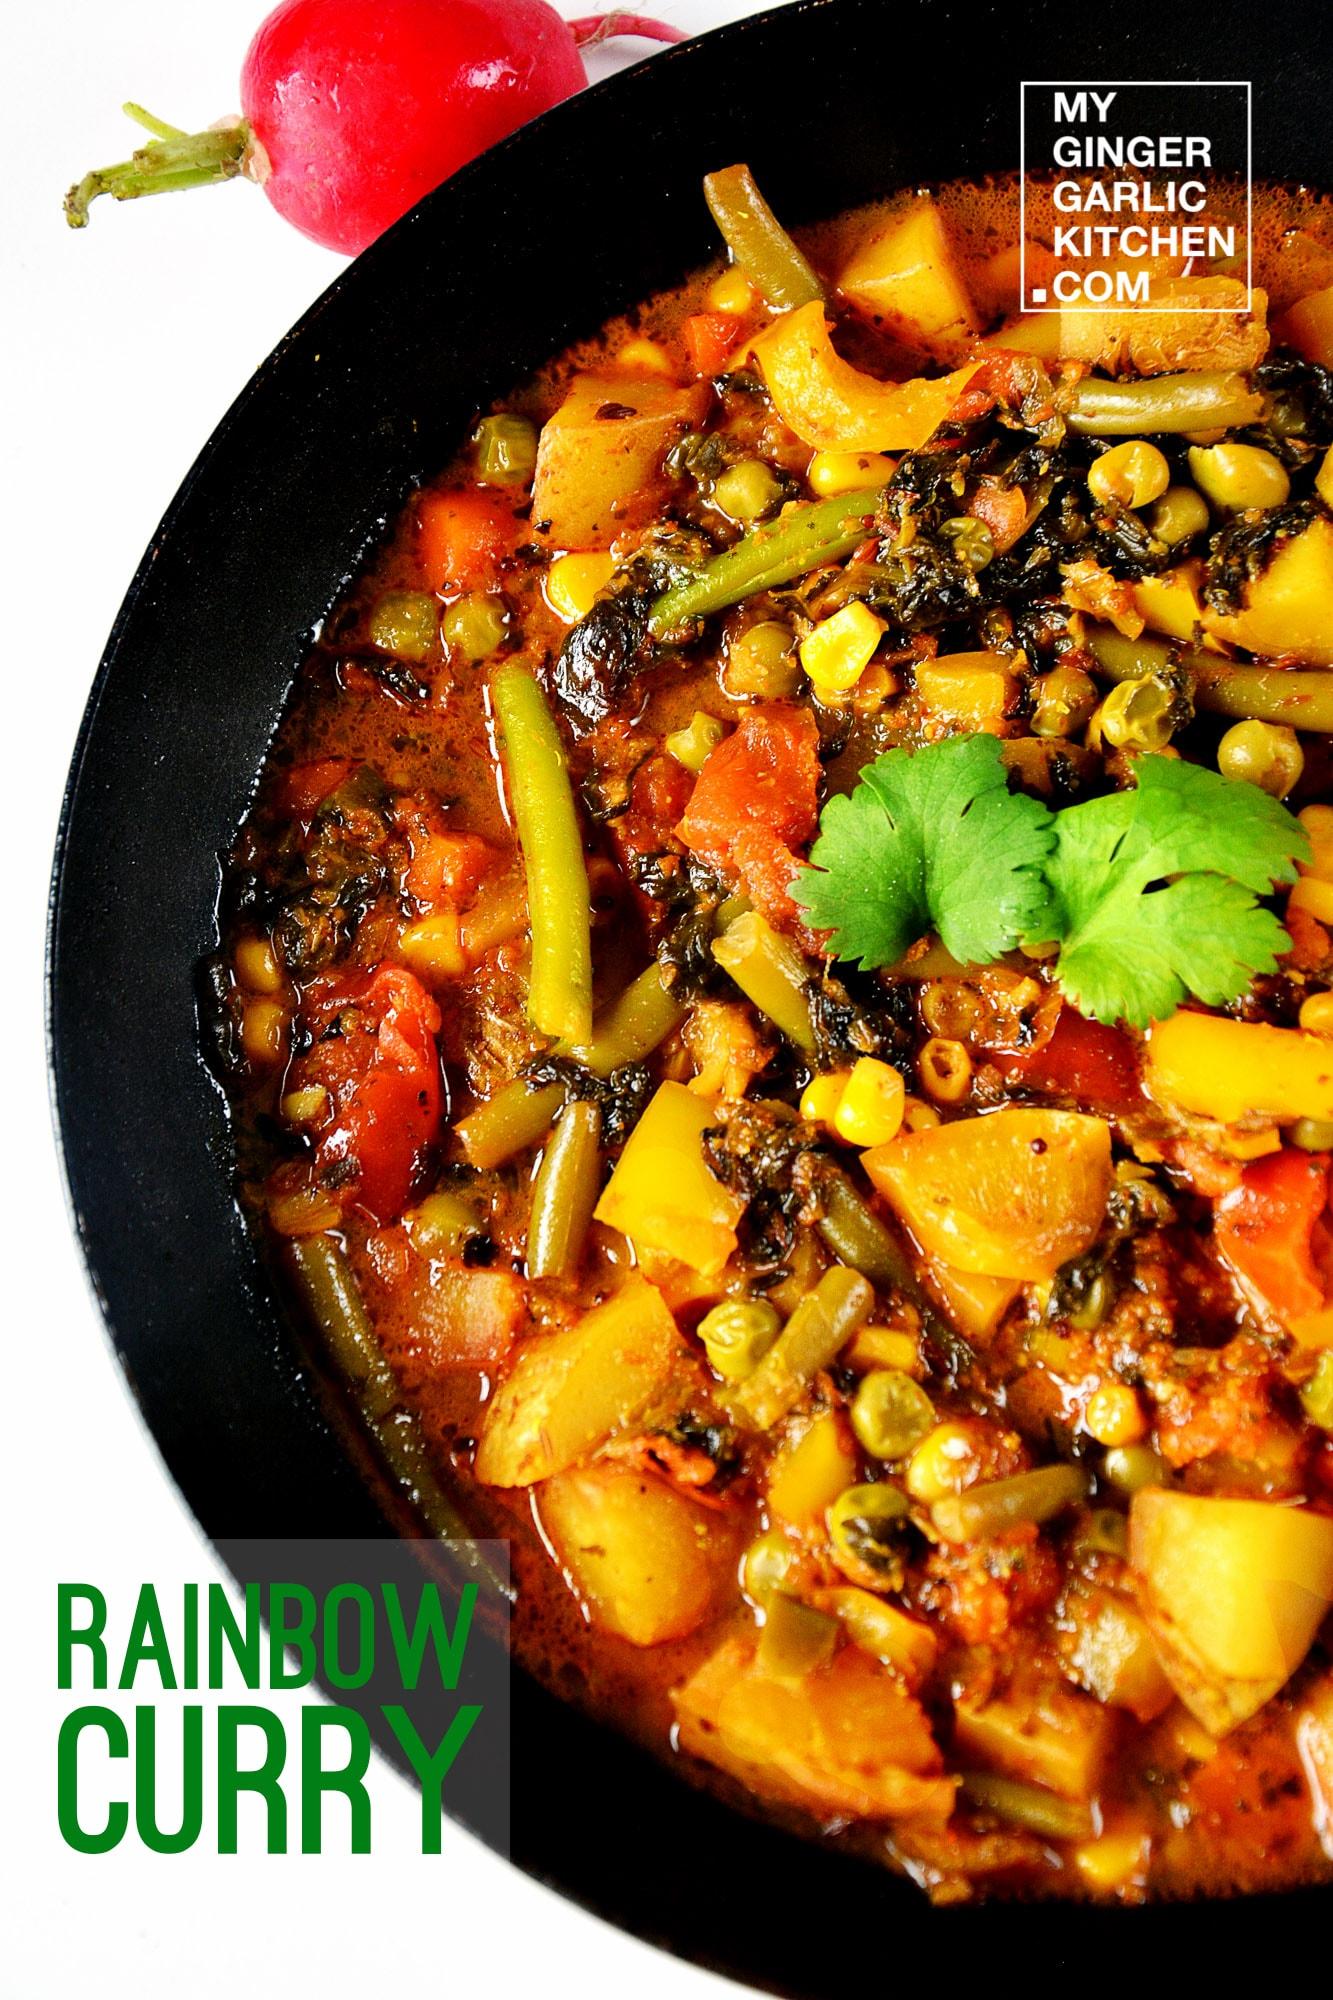 recipe-pressure-cooker-rainbow-curry-anupama-paliwal-my-ginger-garlic-kitchen-4 copy